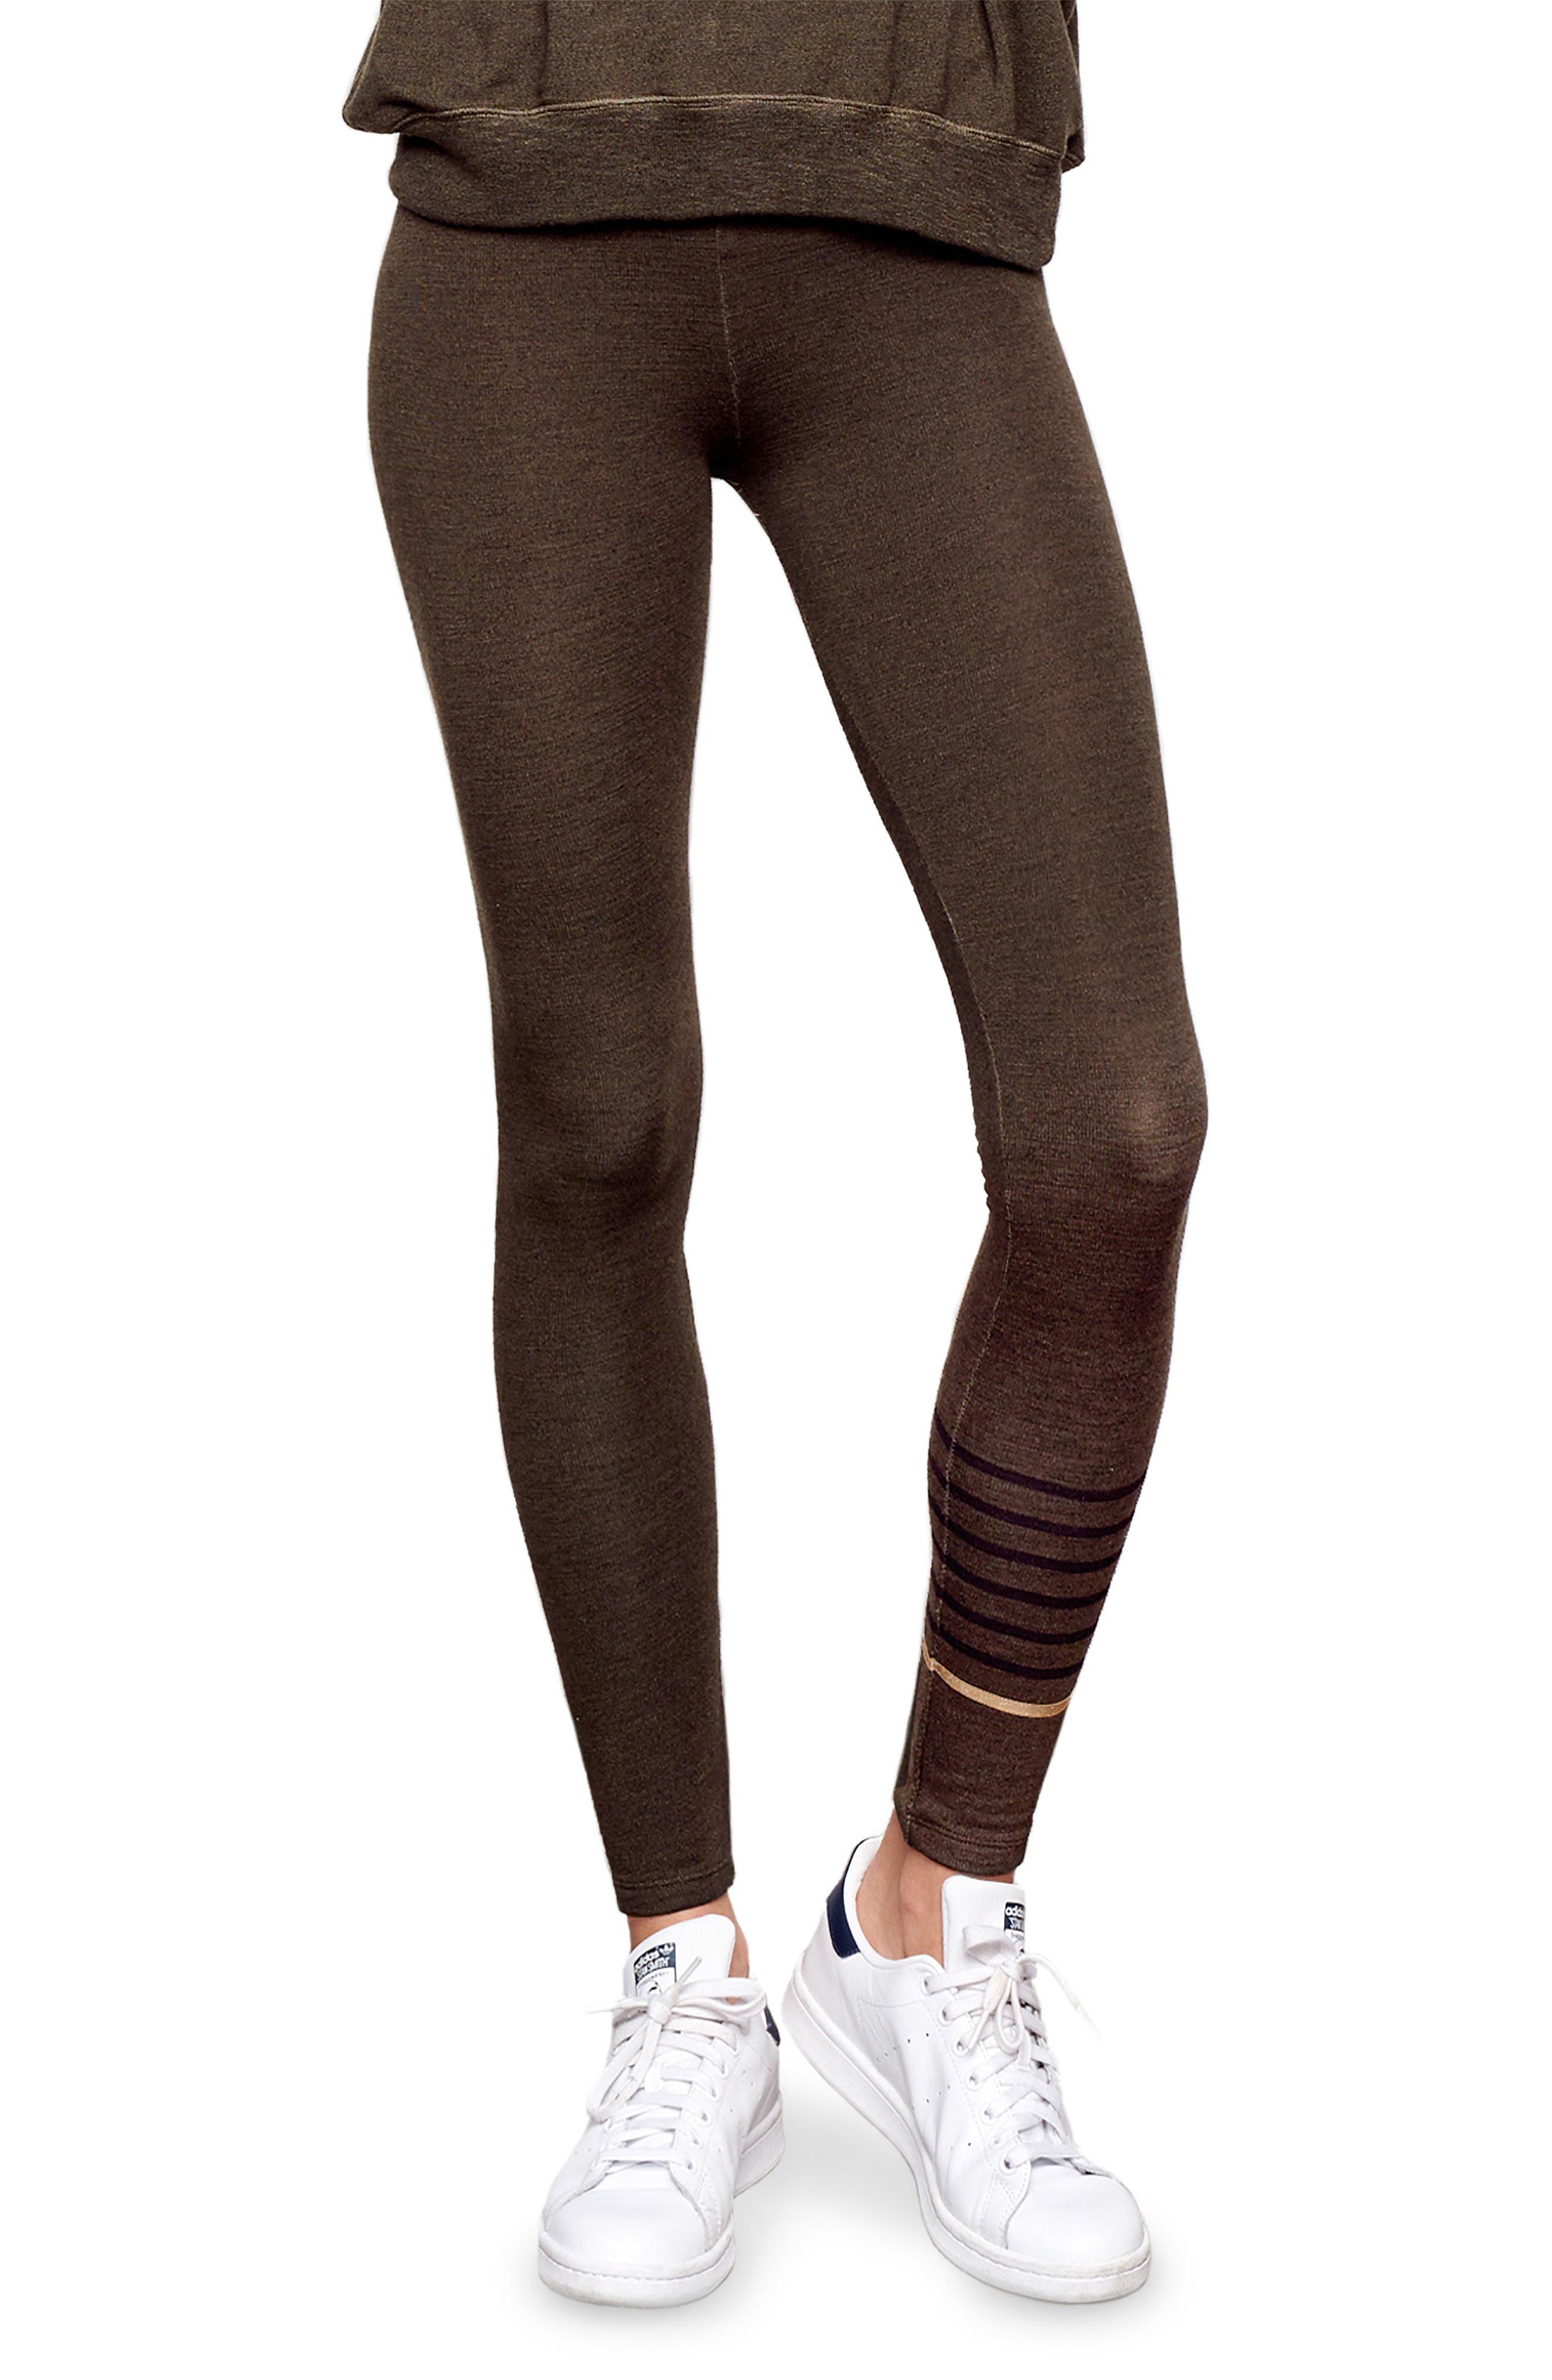 a50c4b94b128 Women s Sundry Workout Clothes   Activewear